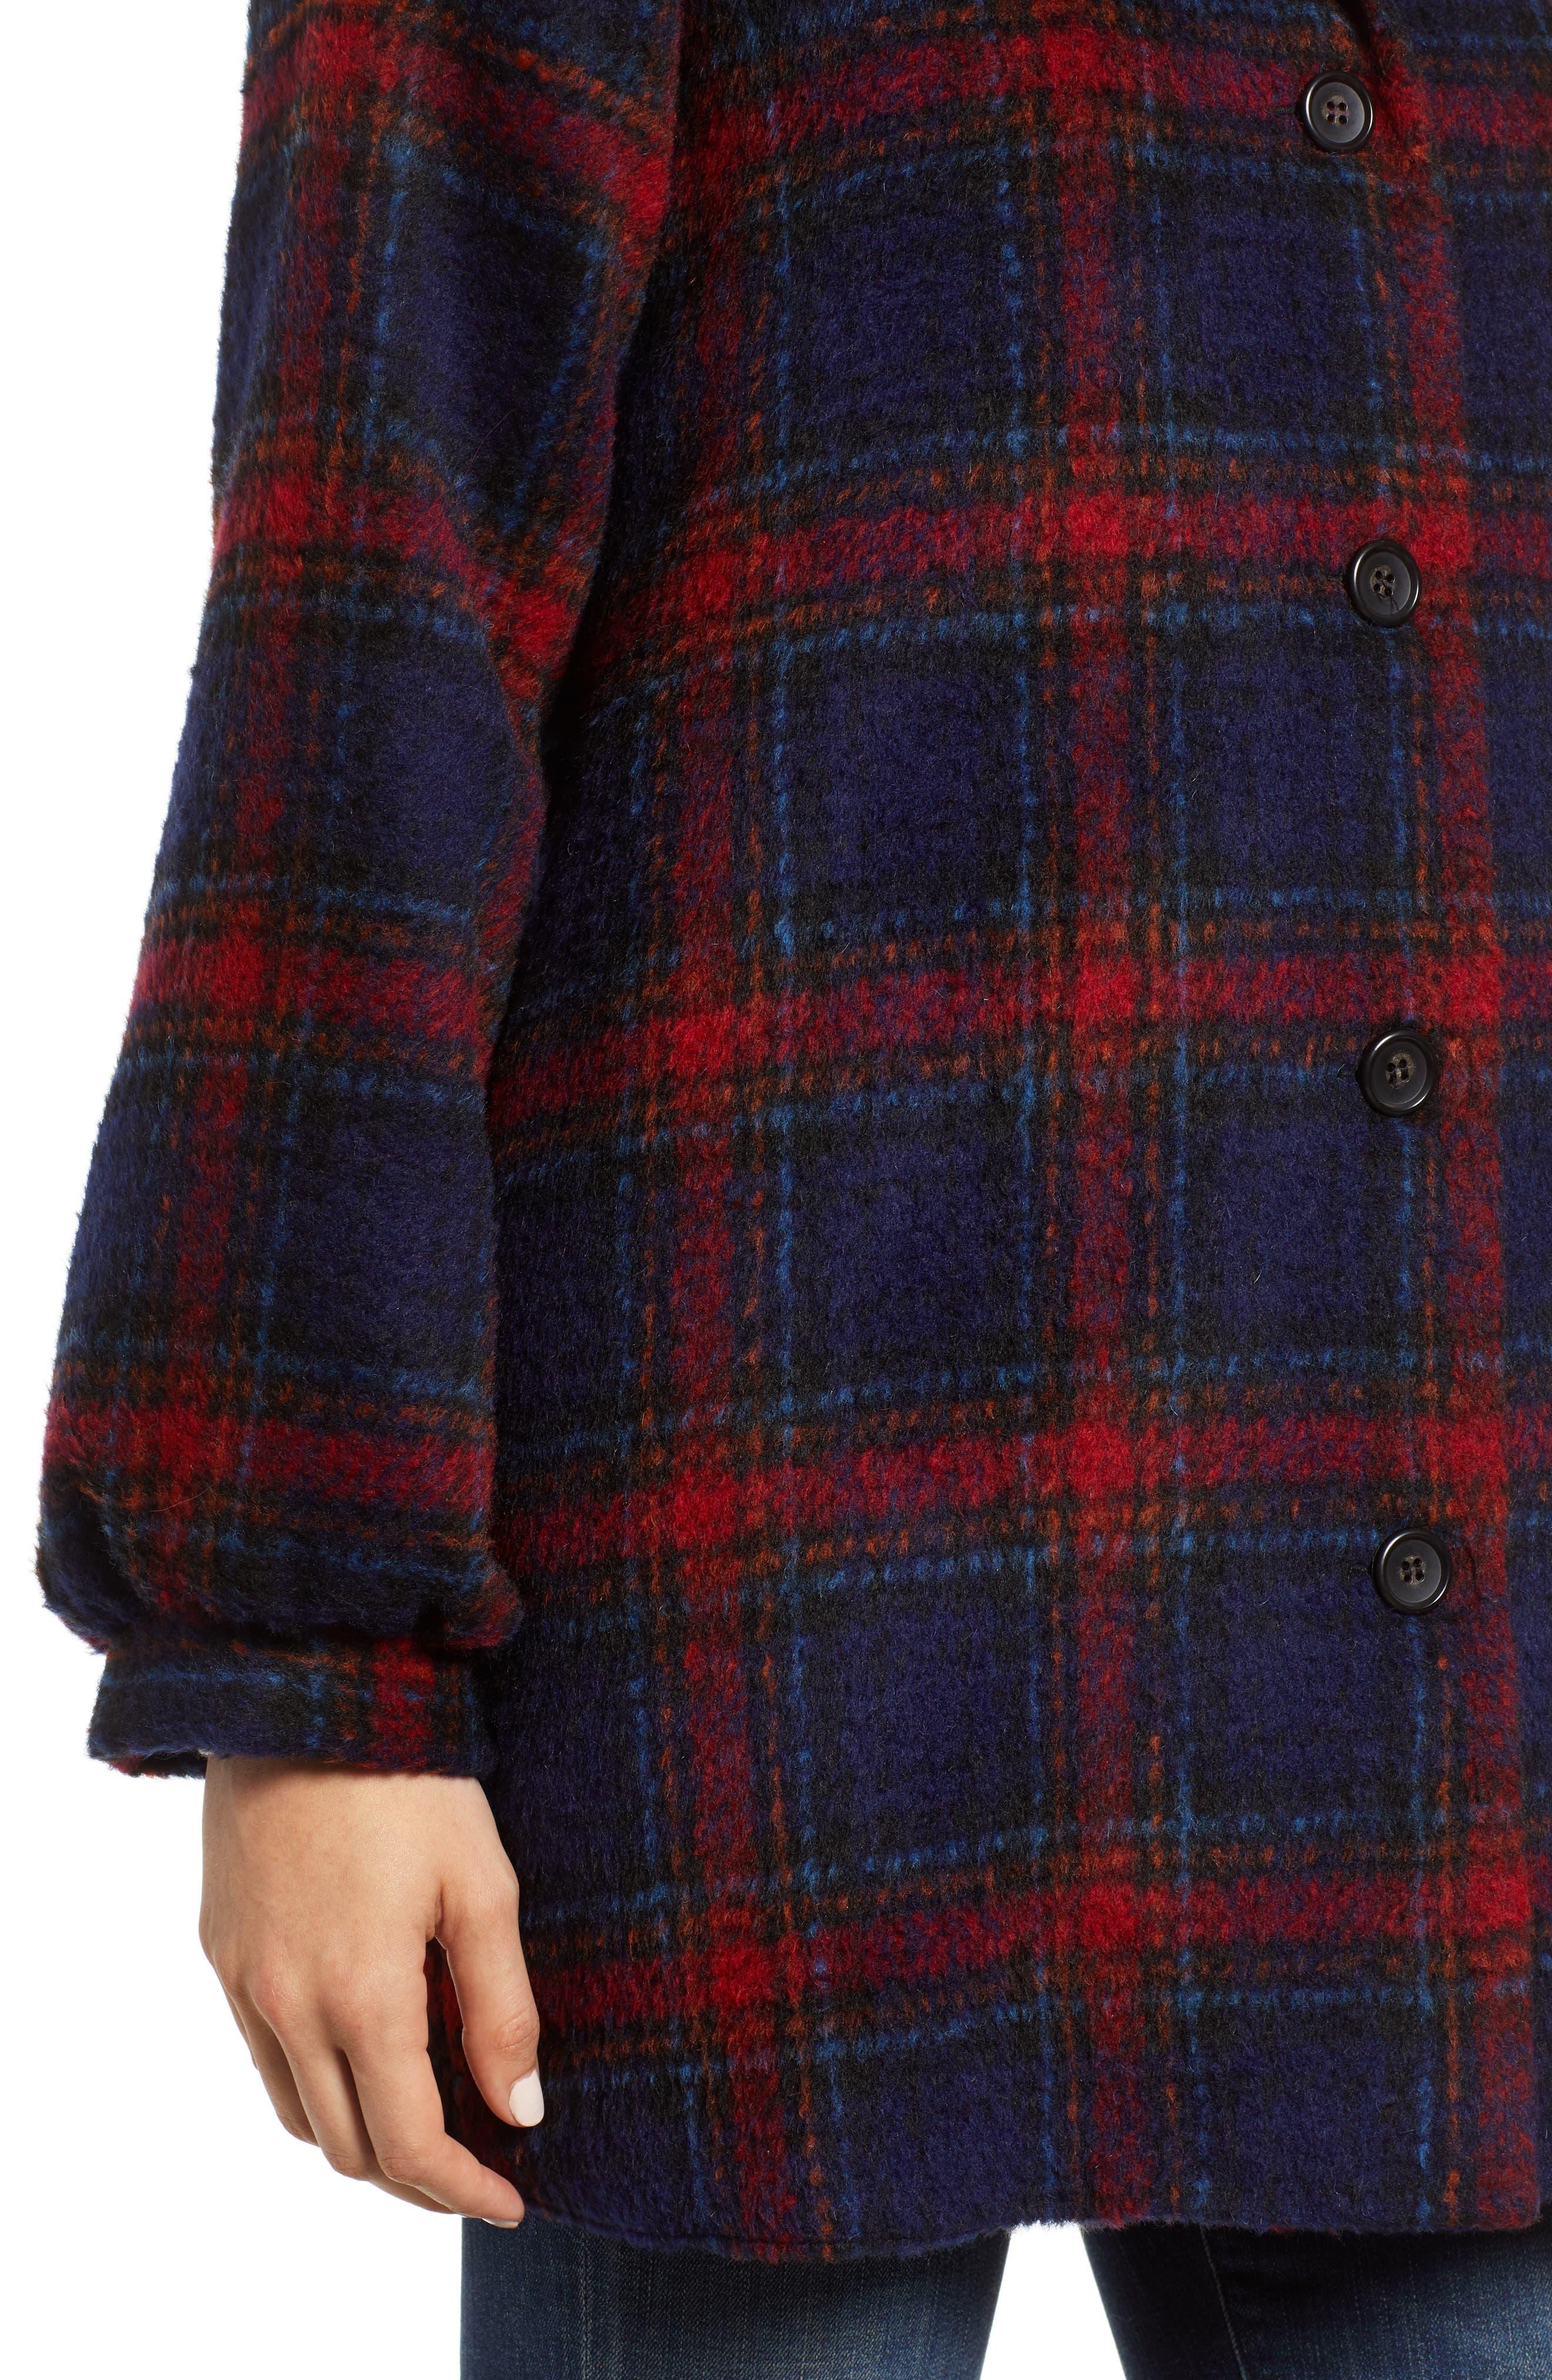 Plaid Wool Blend Jacket,                             Alternate thumbnail 4, color,                             MULTI